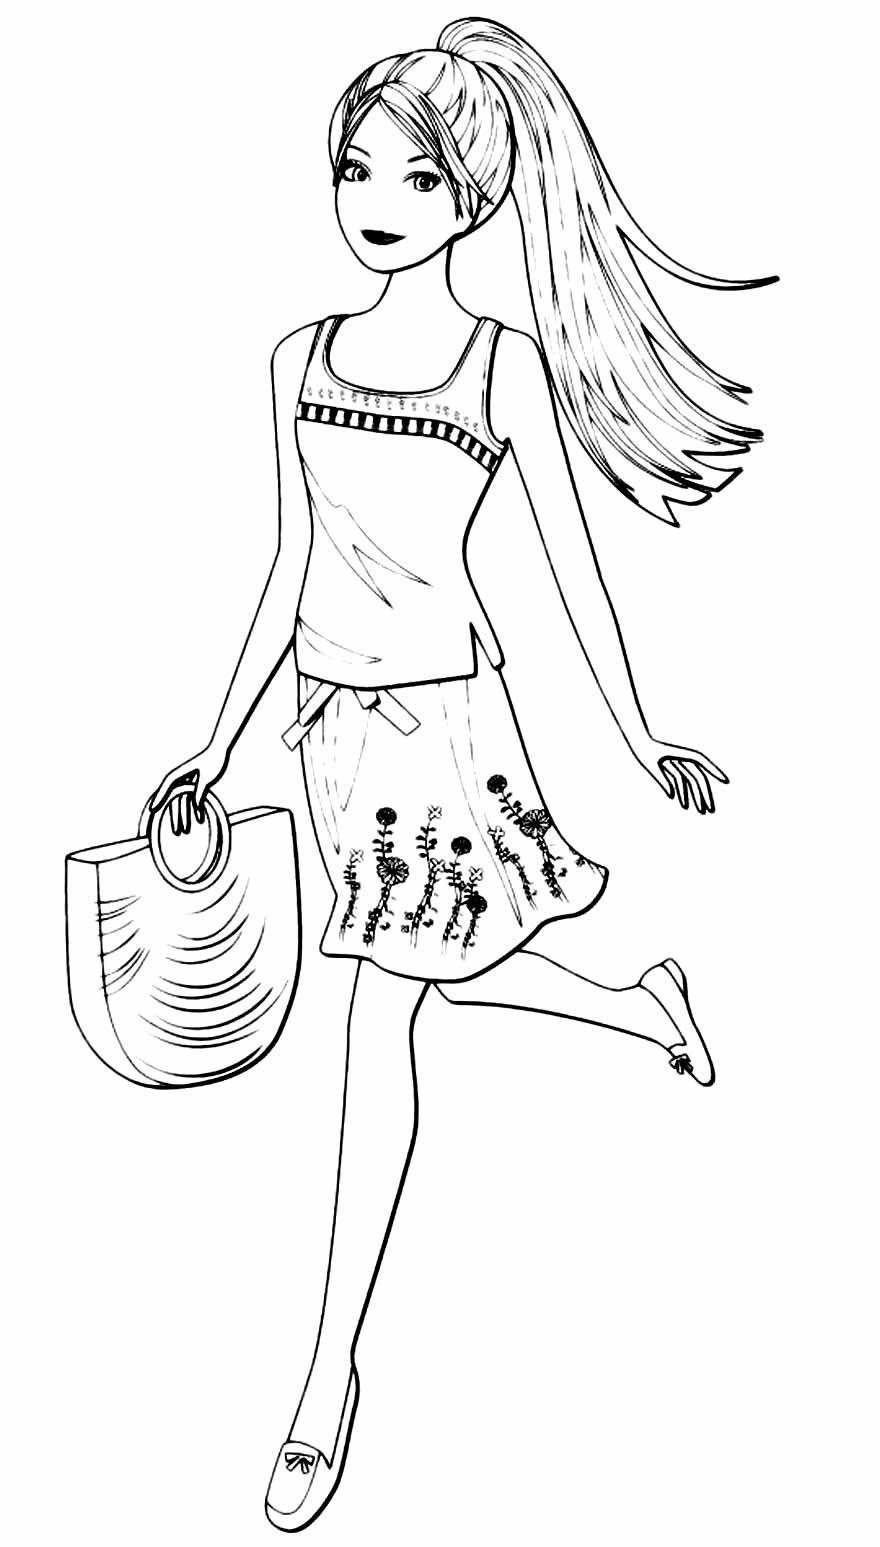 Coloriage Barbie avec sac